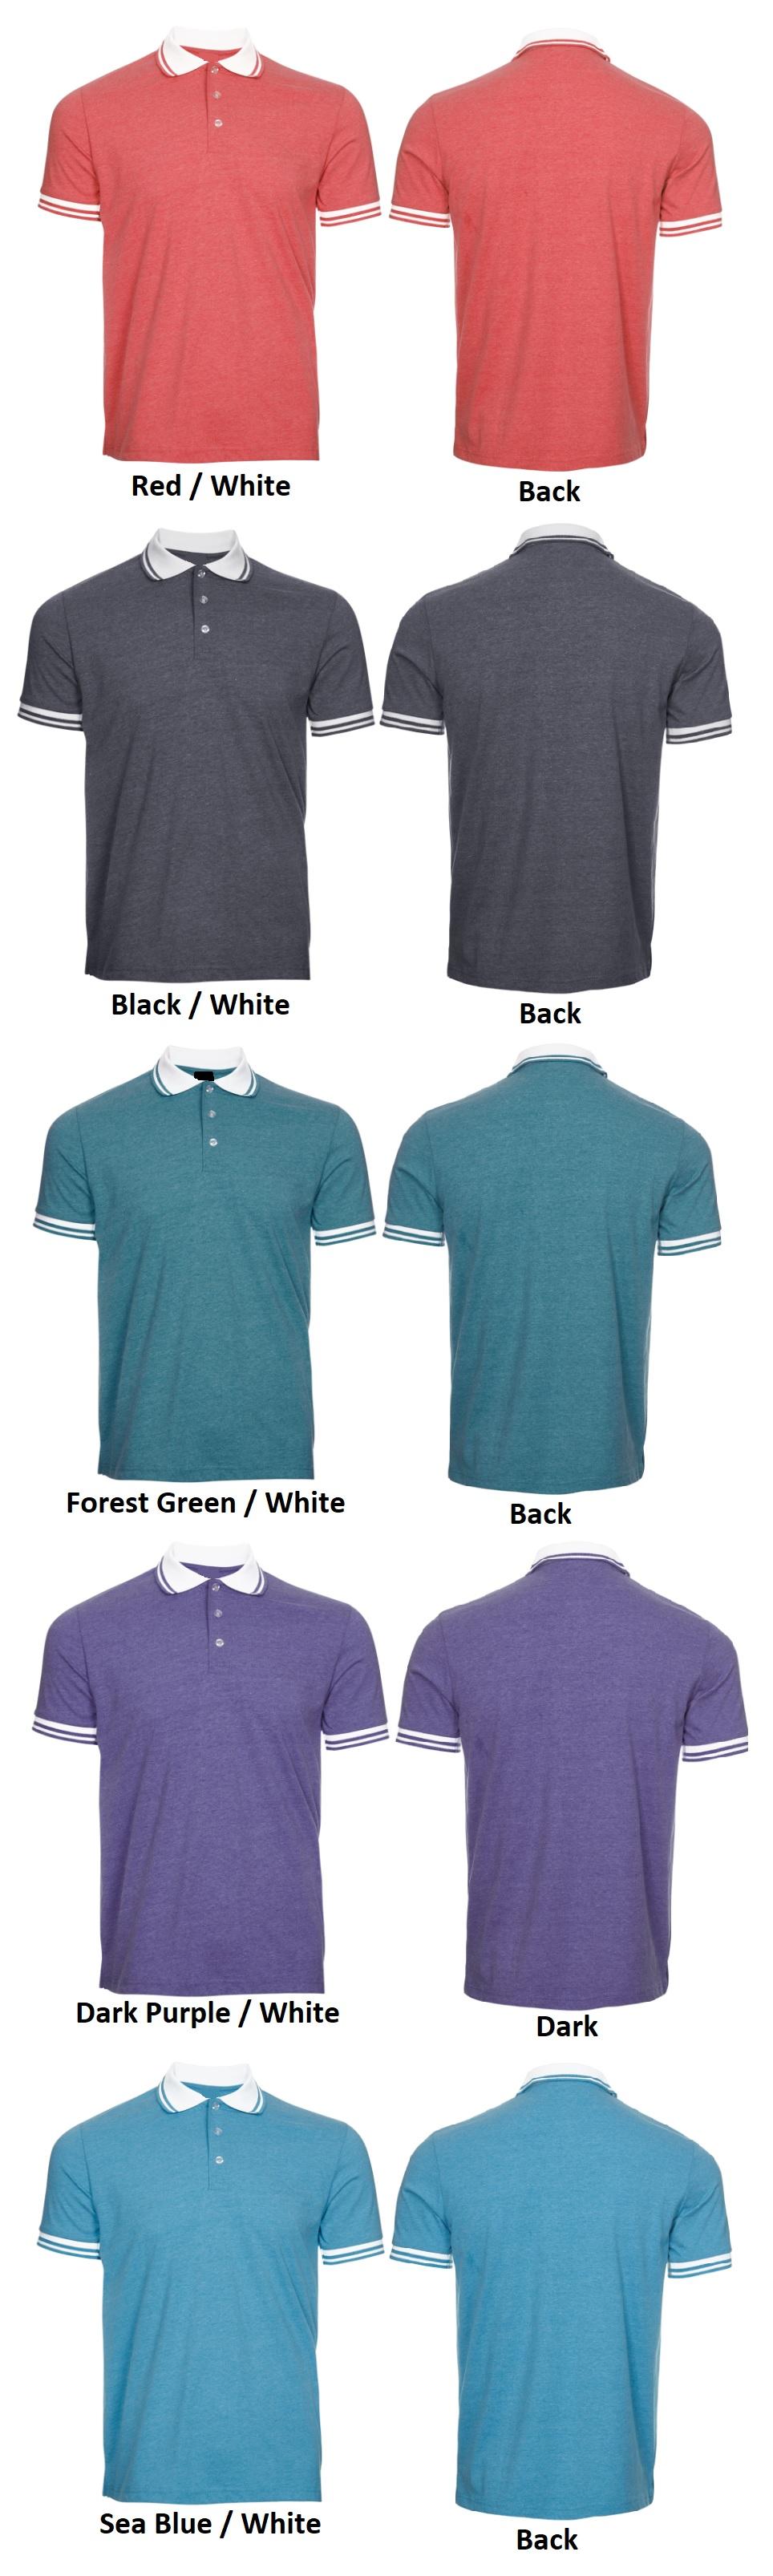 Single Jersey Polo T-Shirt